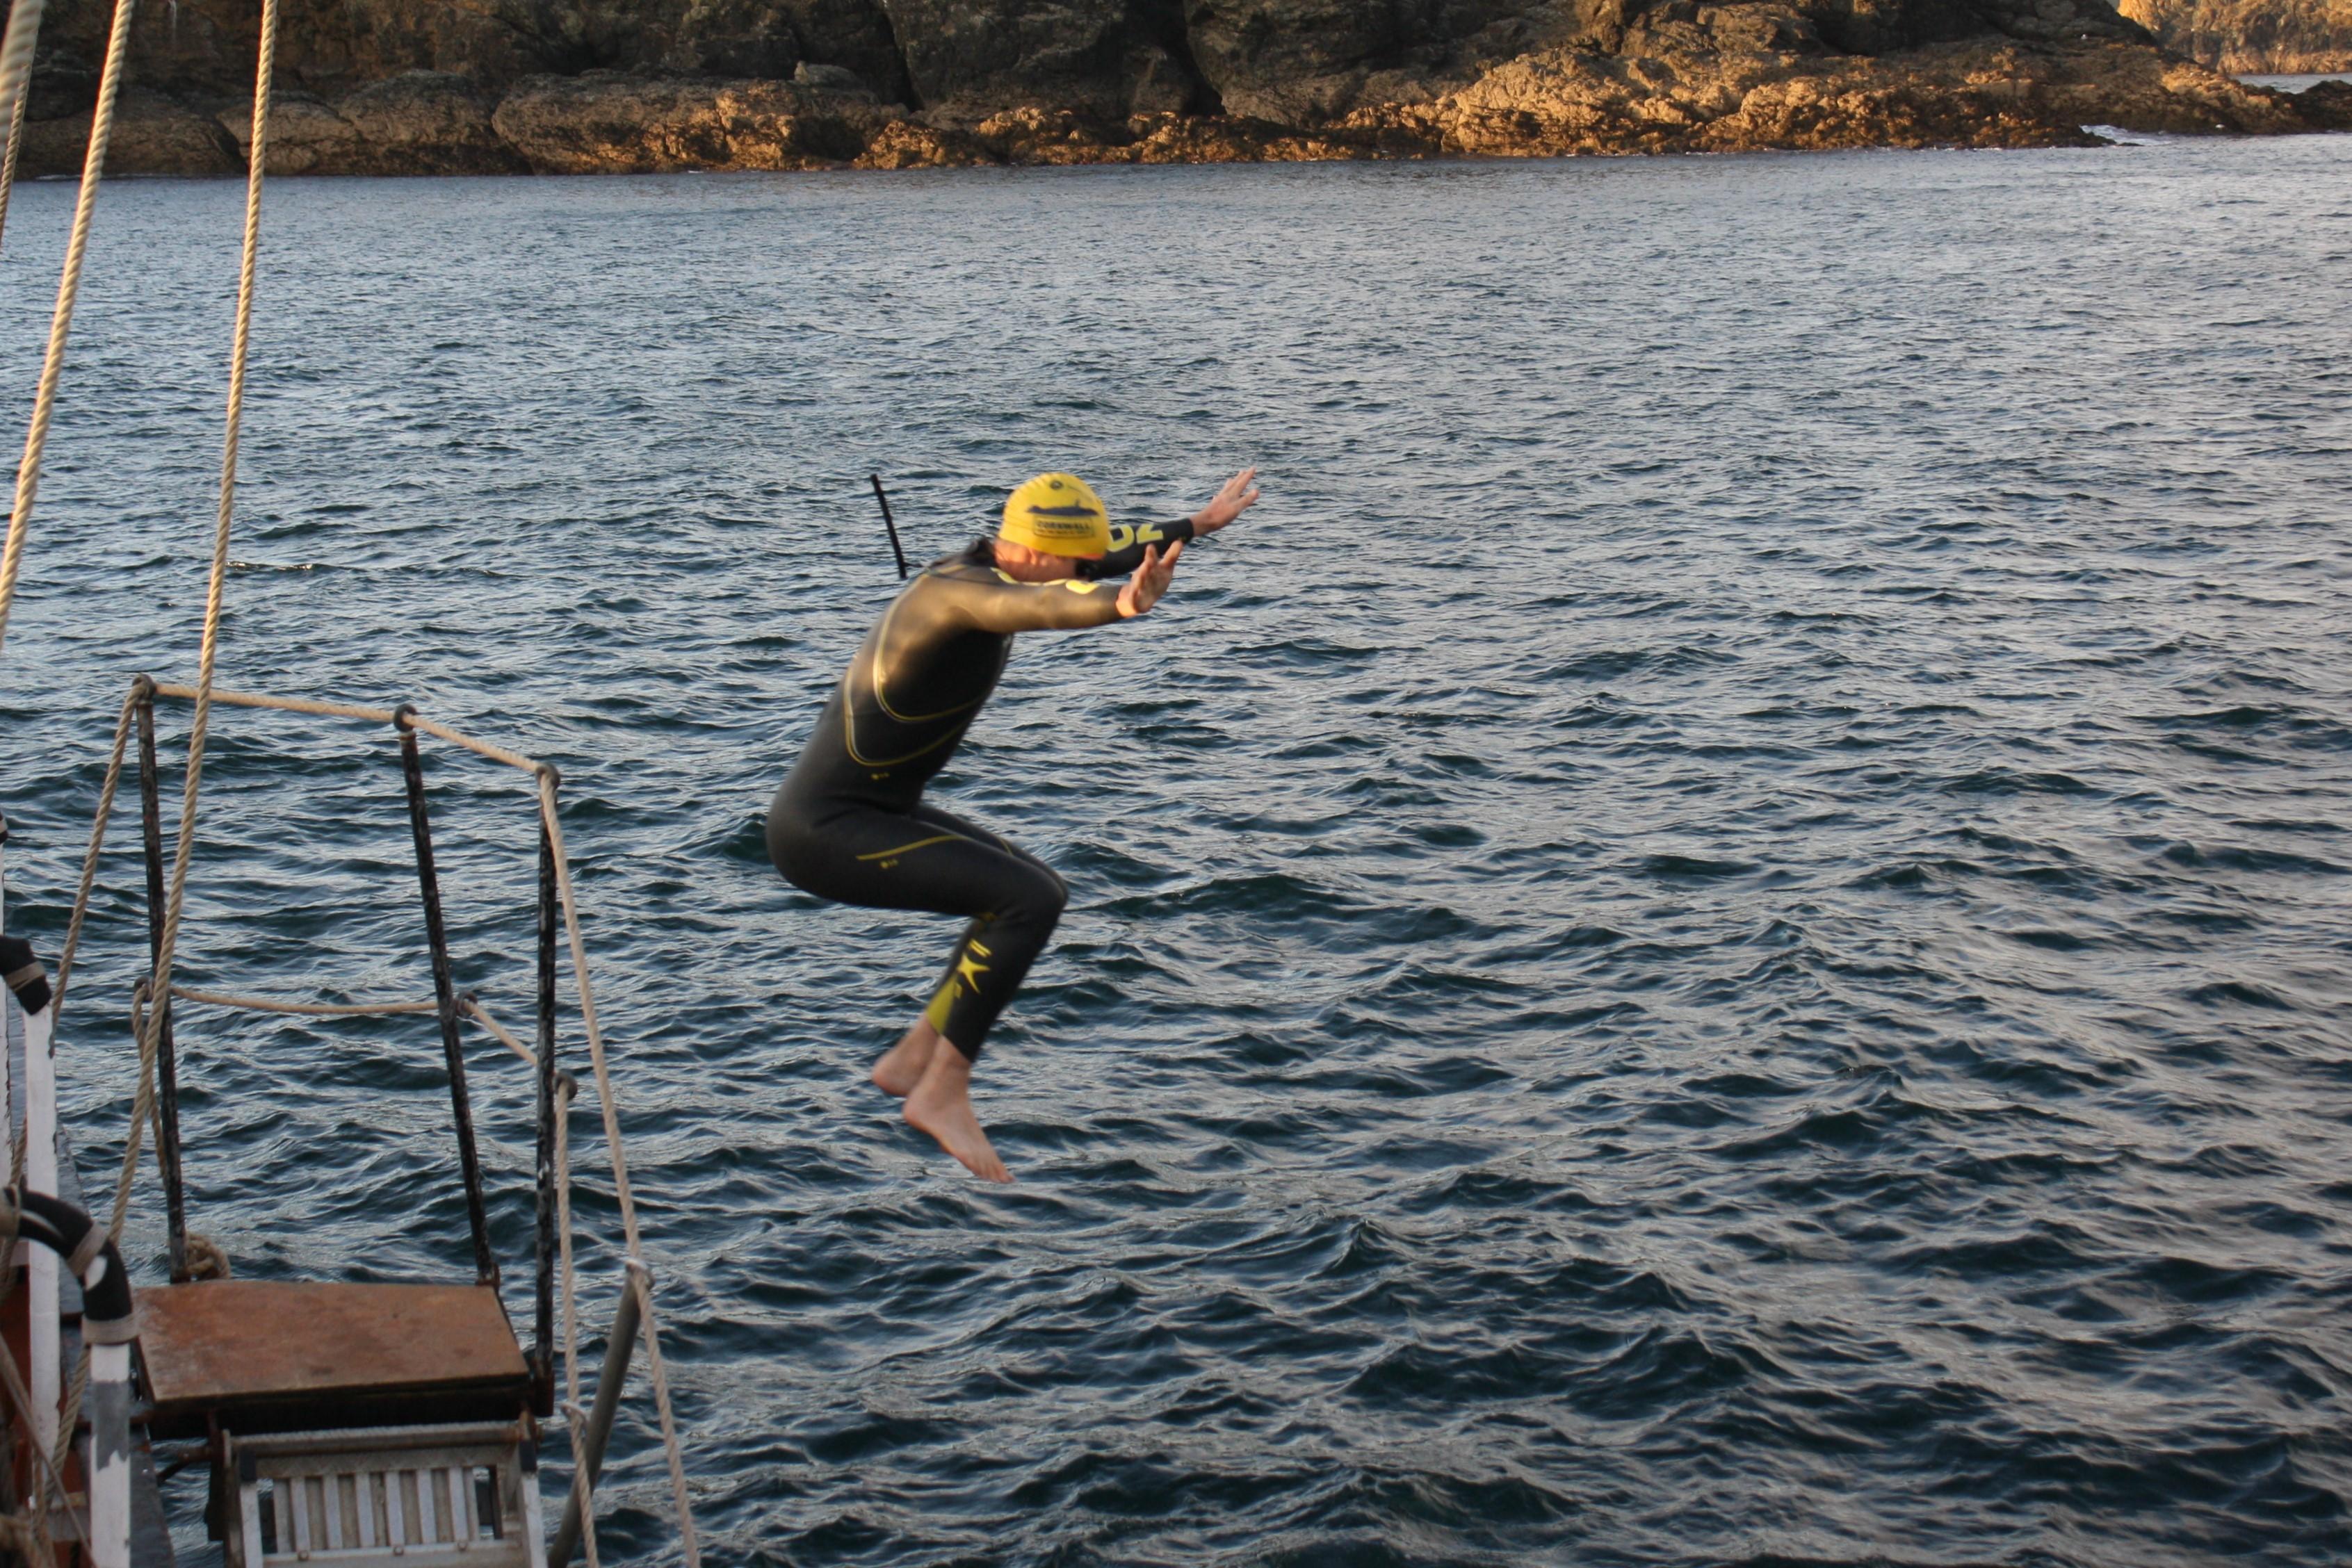 SwimTrek - Cold Water Jump